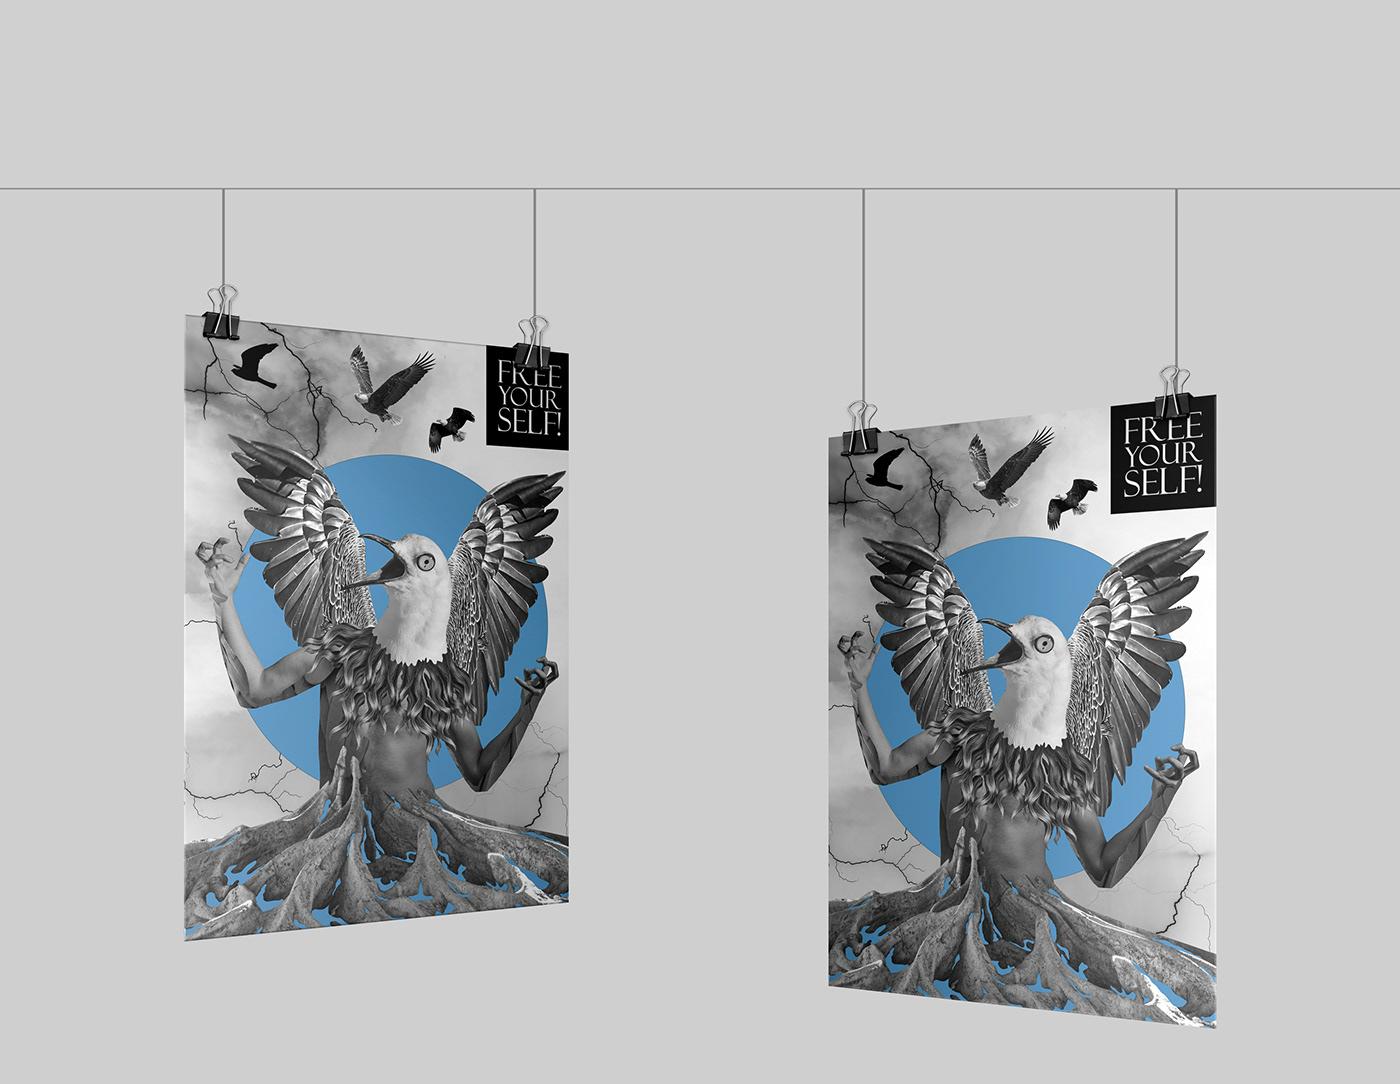 art Character collage graphic art ILLUSTRATION  Poster Design print conceptual Digital Art  postcard